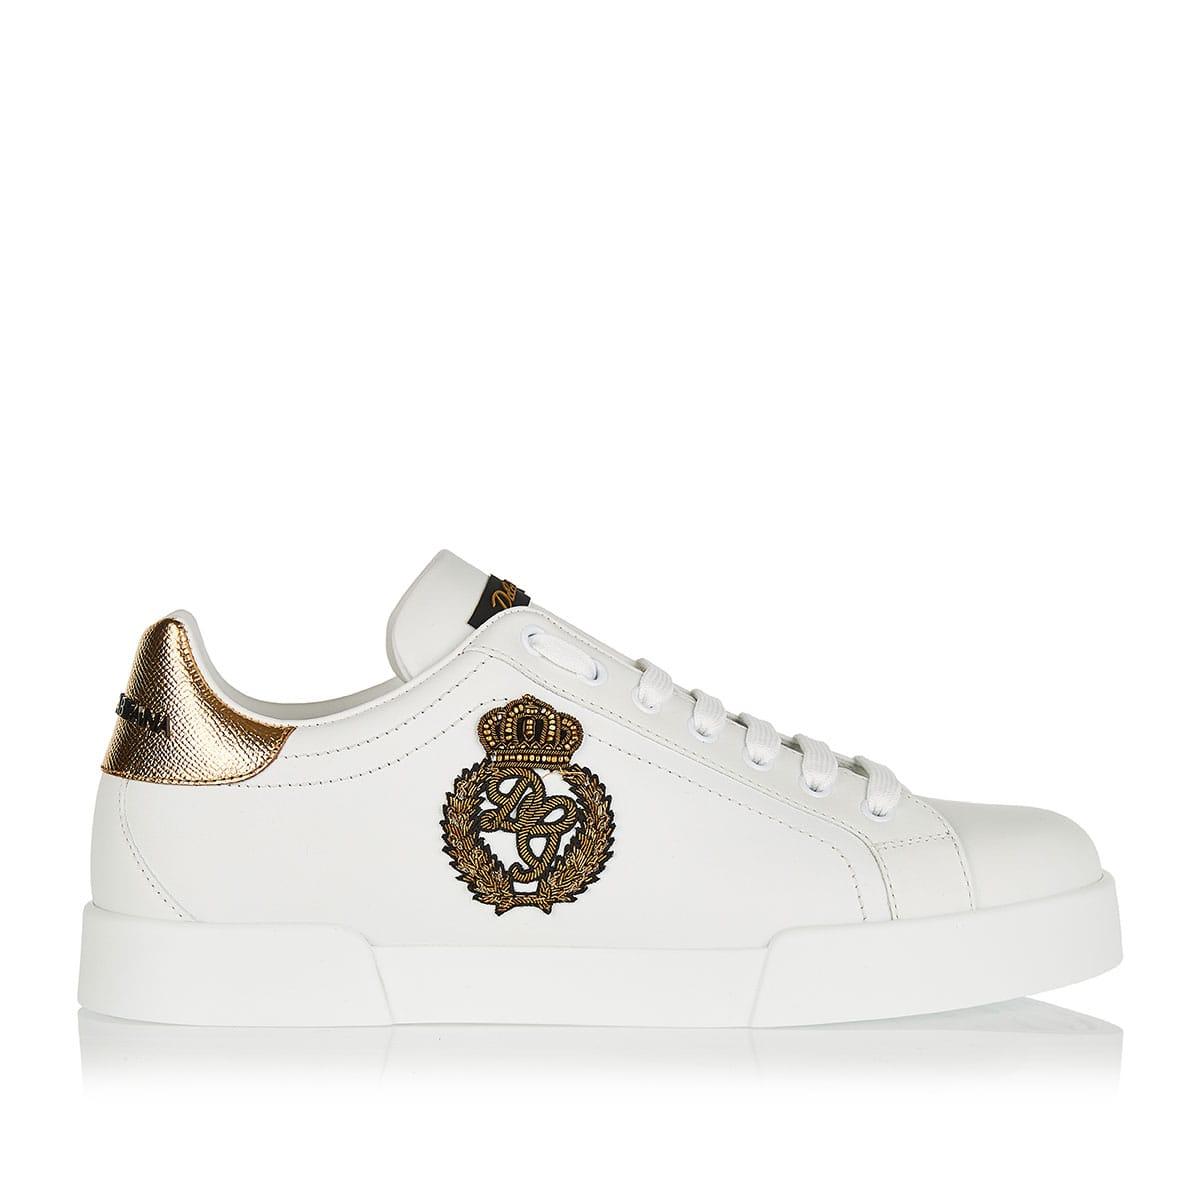 Portofino crown embellished sneakers